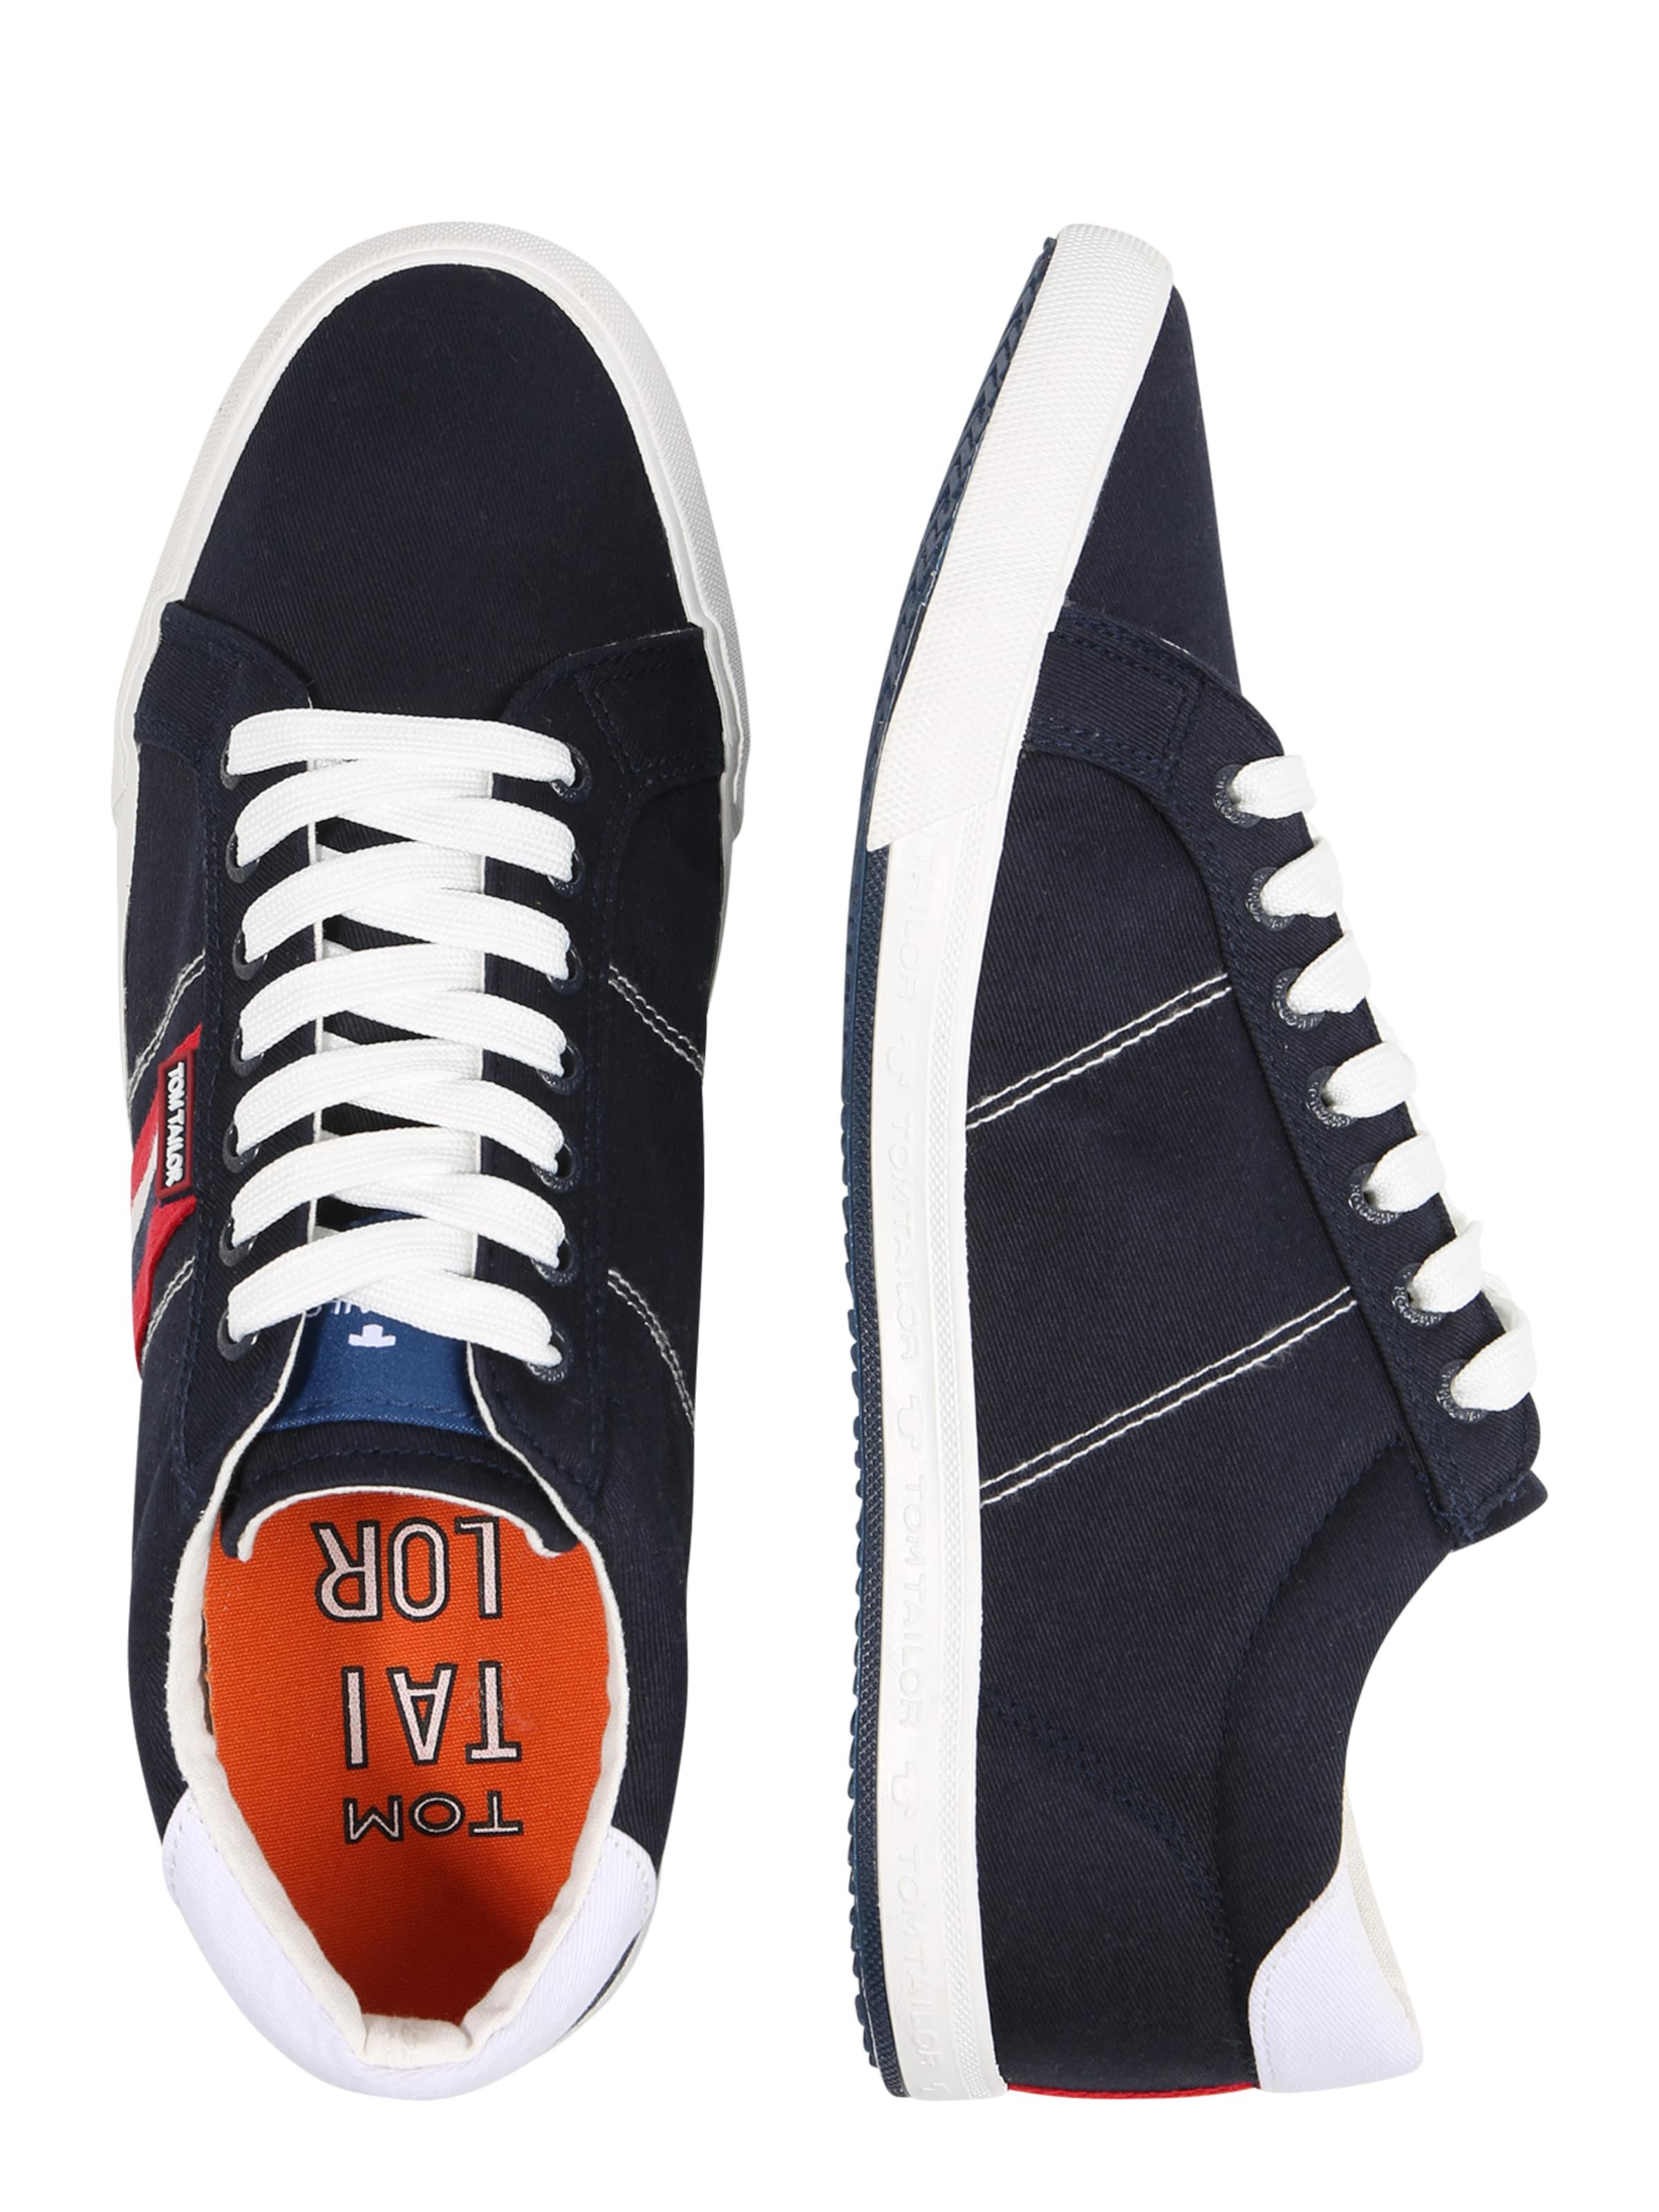 DunkelblauHellrot Weiß In Tailor Tom Sneaker ikXZPu